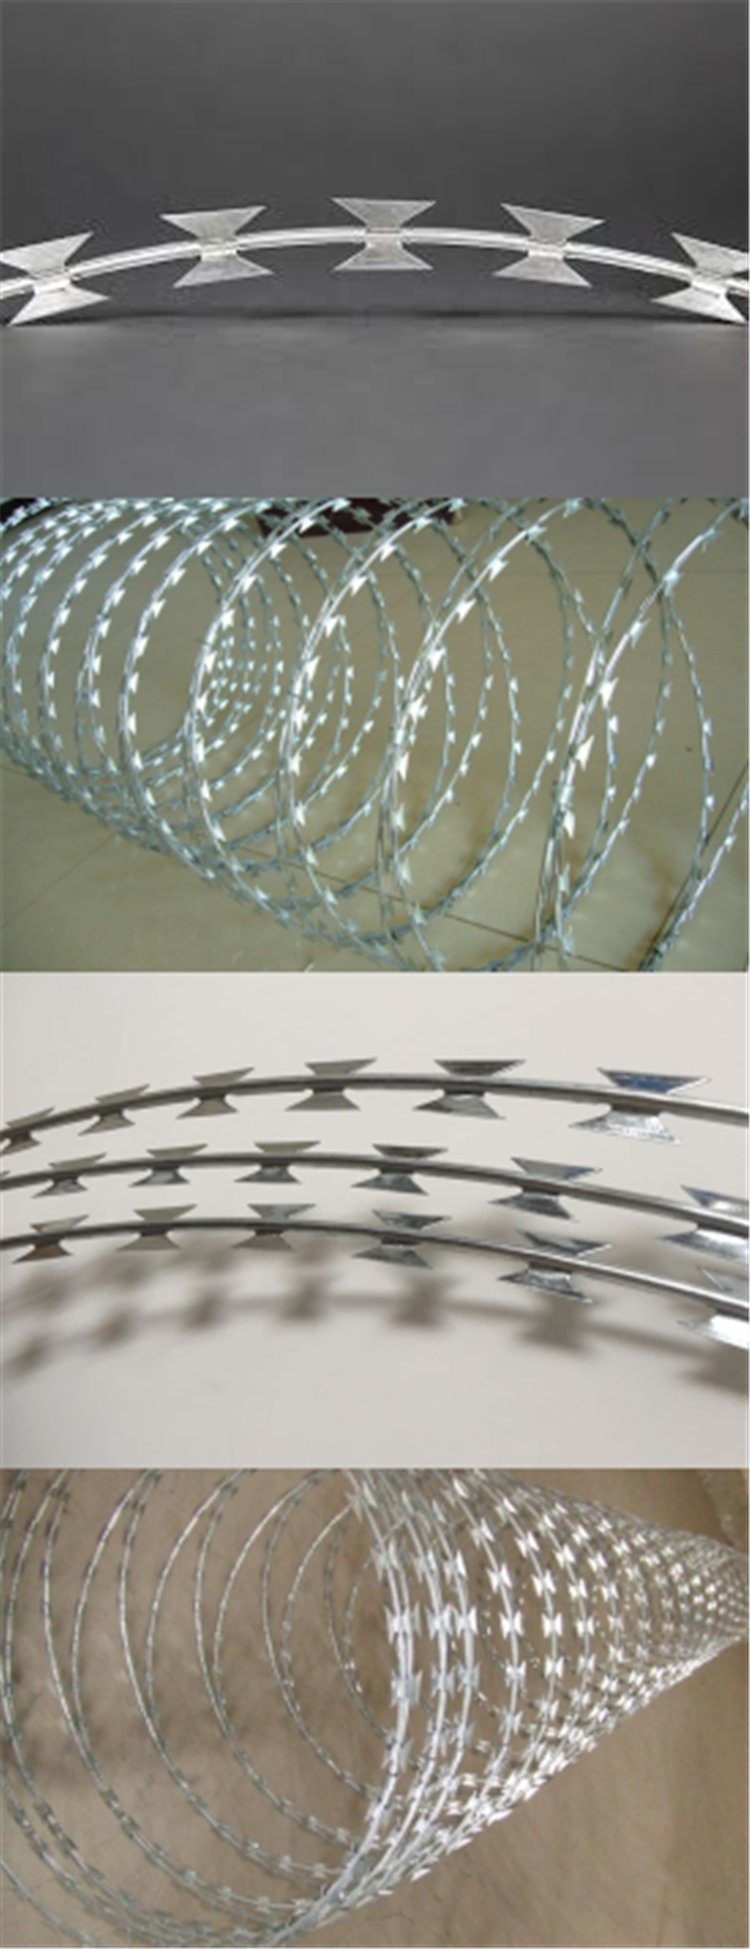 Galvanized Cheap Price Razor Concertina Barbed Wire China Manufacturer